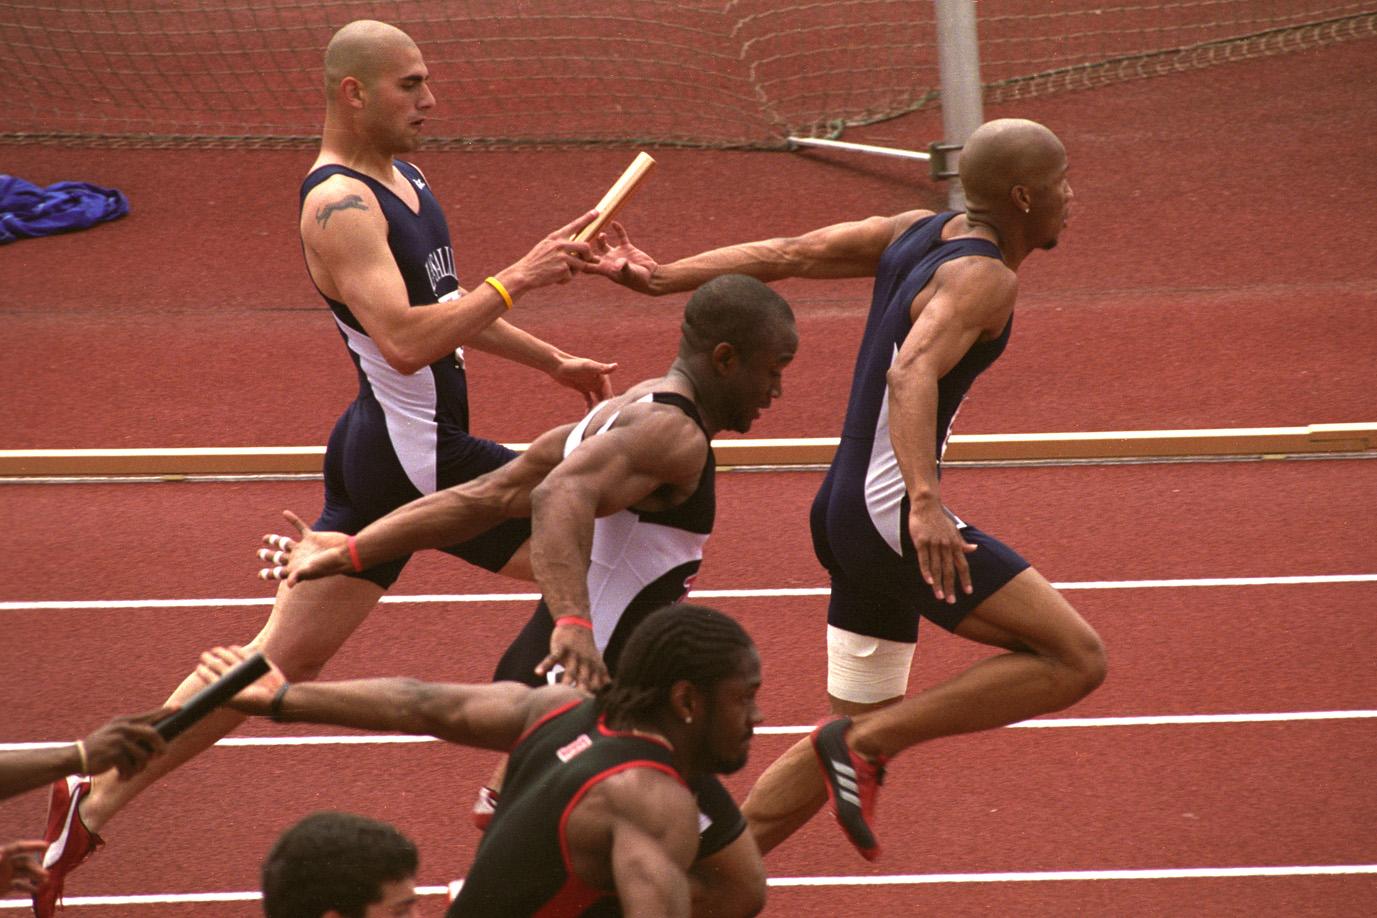 sports relay action sprint race photographs princeton exchange baton edu